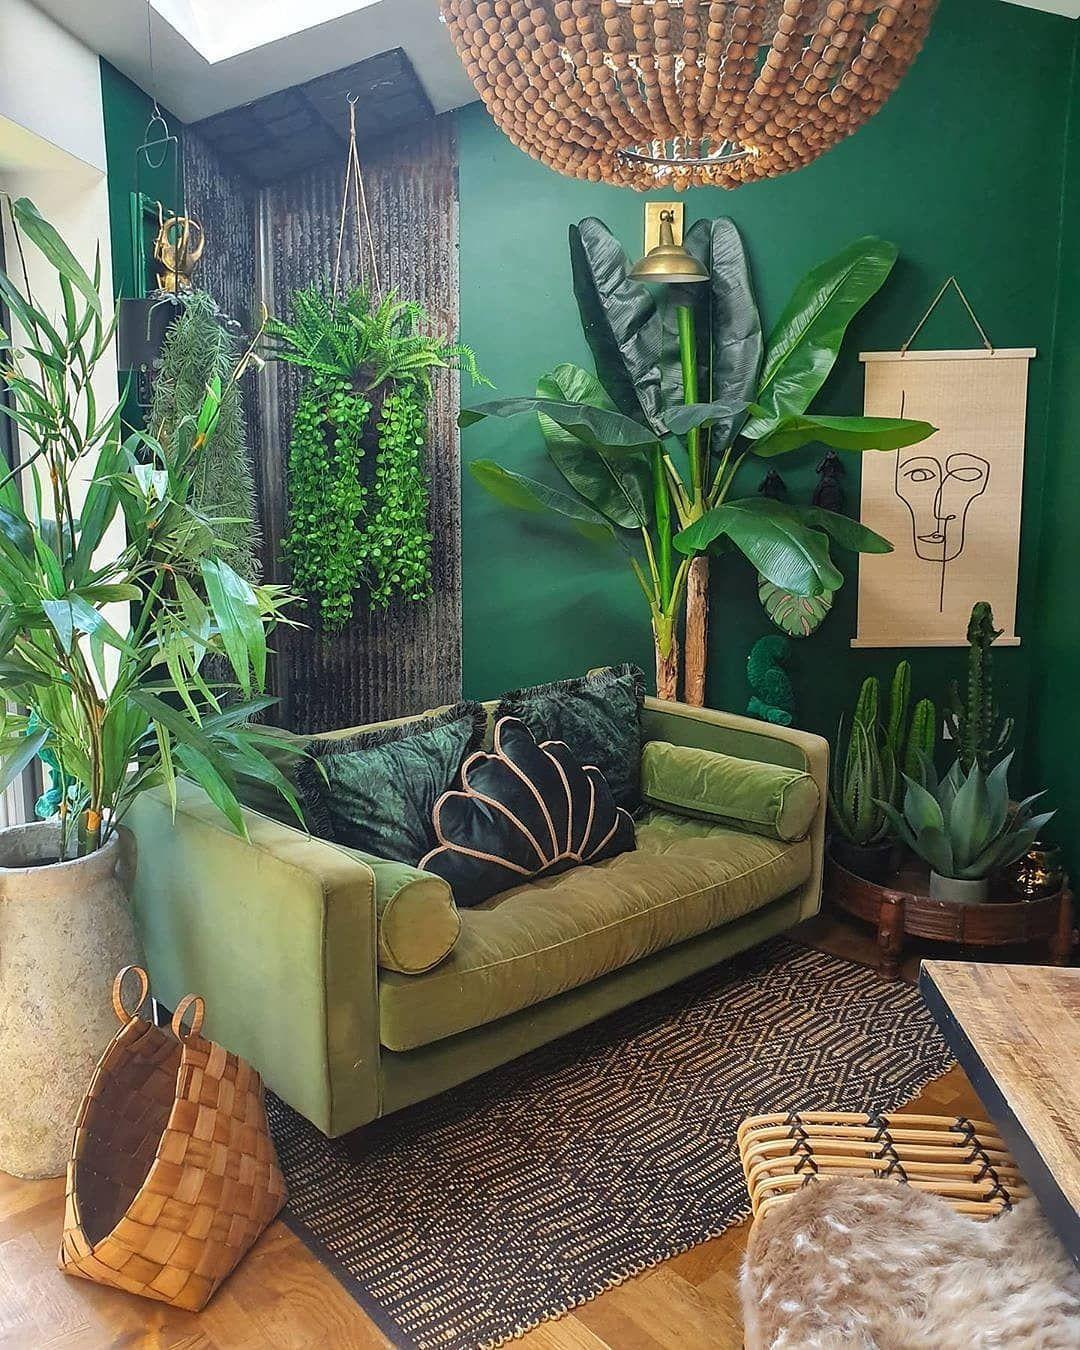 Home Decor Interior Designs On Instagram Love This Jungle Livingroom Absolutely Unique Do You Lik Budget Home Decorating Interior Design Home Decor Jungle living room ideas